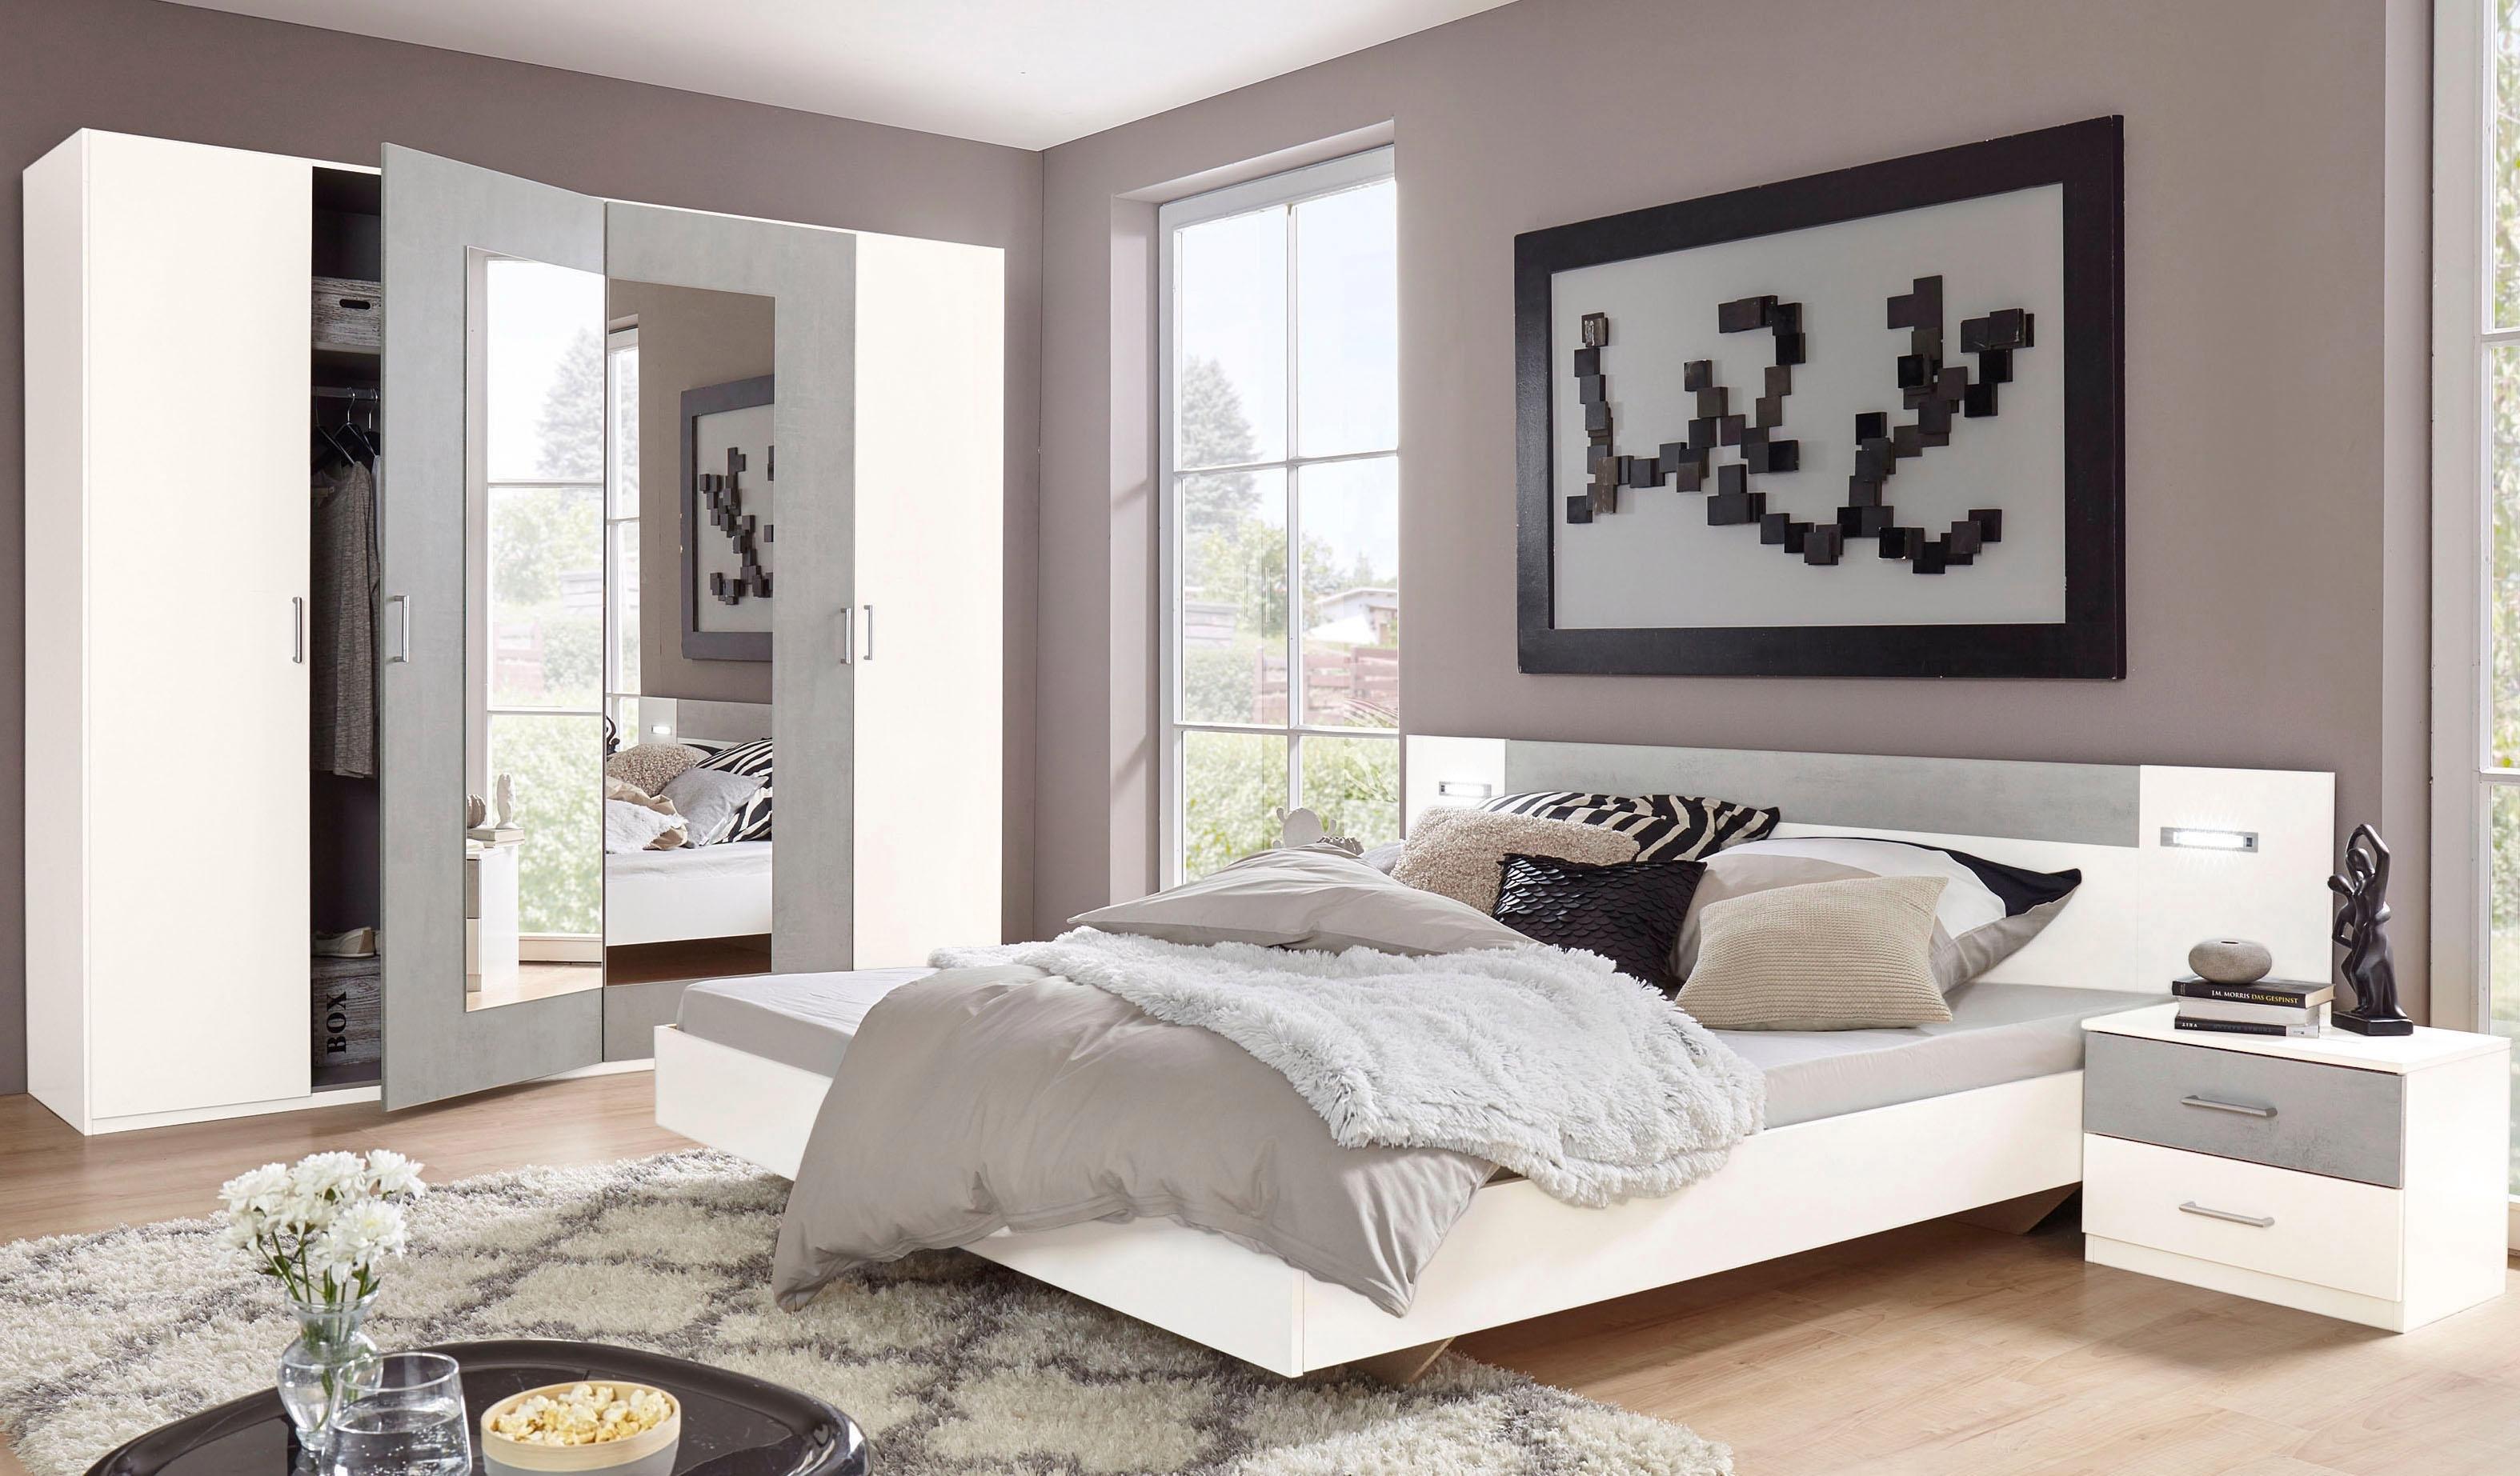 Spiksplinternieuw Complete slaapkamer online bestellen? Dat doe je in onze shop | OTTO FU-36